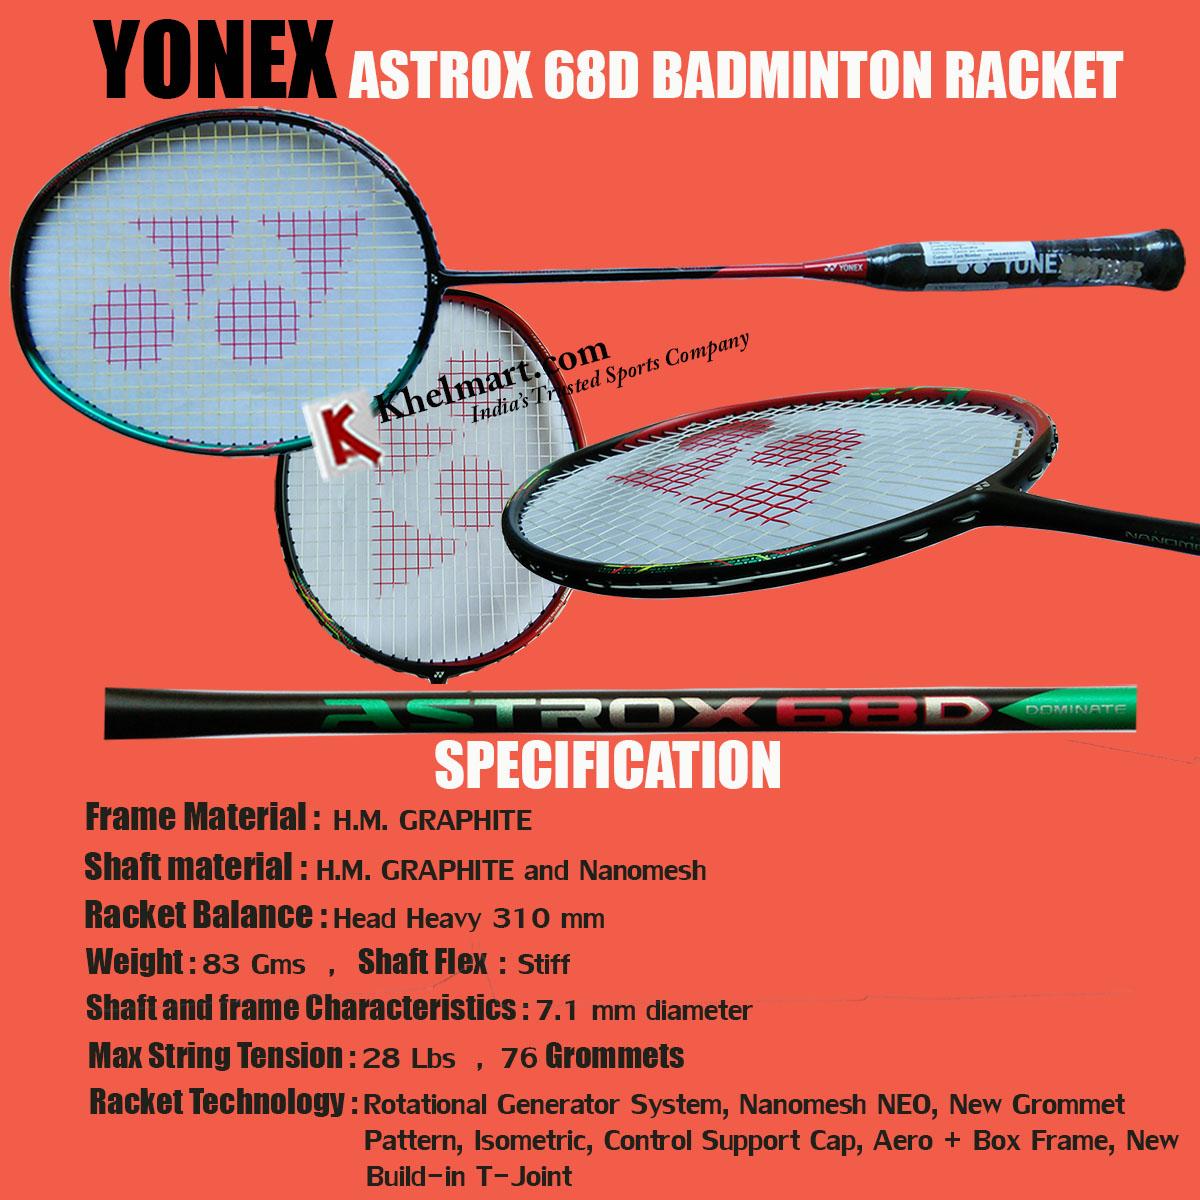 YONEX_ASTROX_68_D_BADMINTON_RACKET